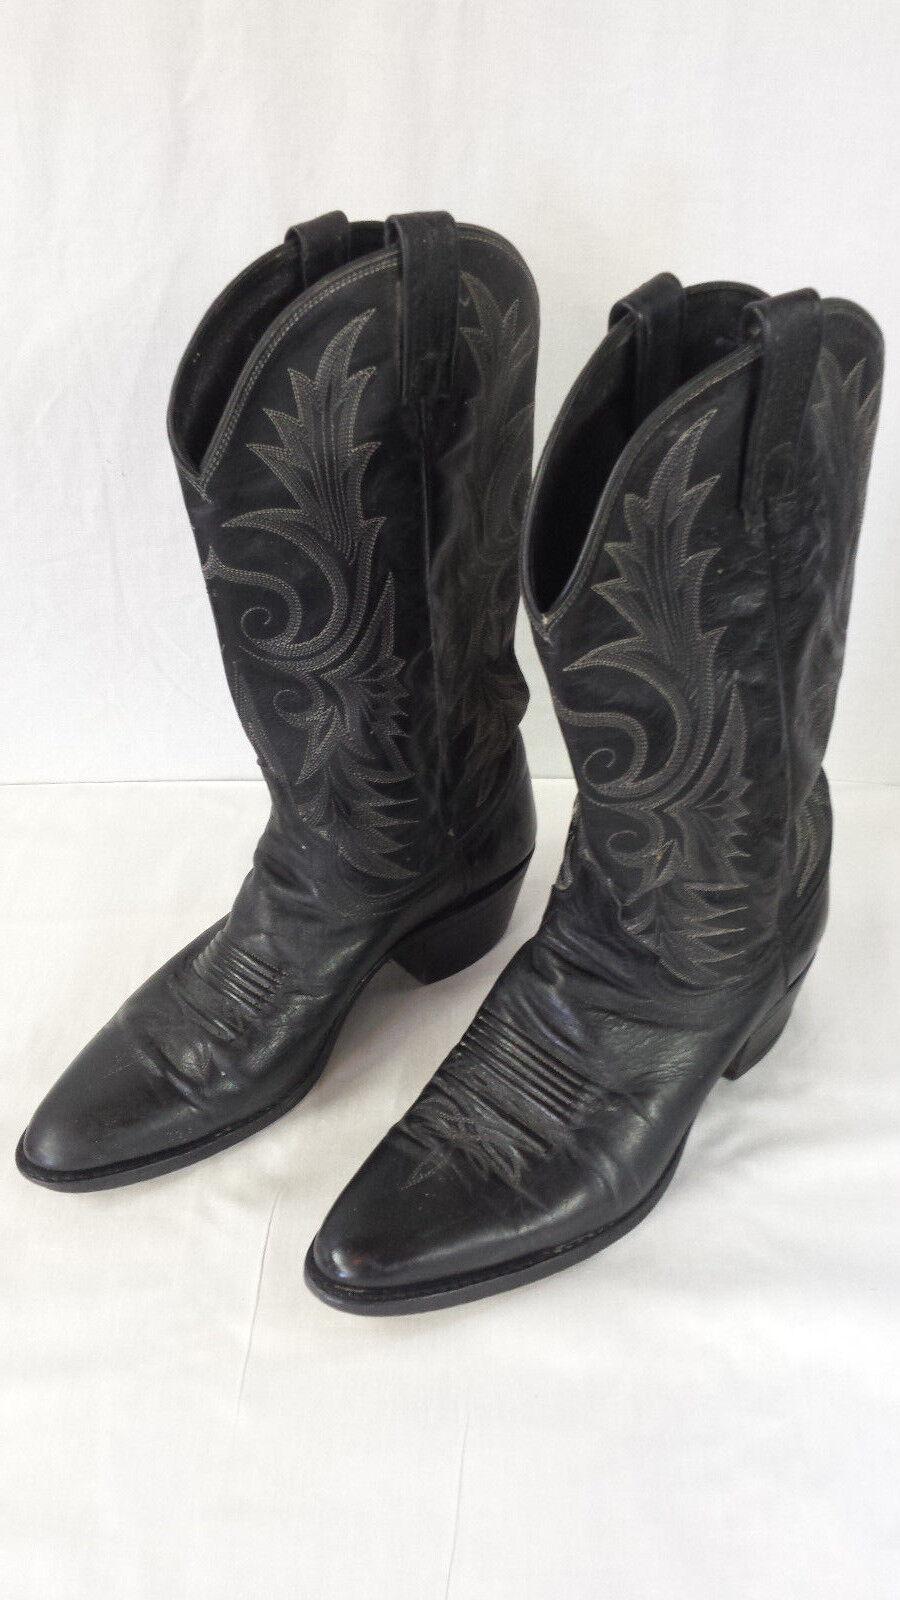 Kangaroo Leather Roper Style Western Cowboy Ride Black Men's Size 9.5 D